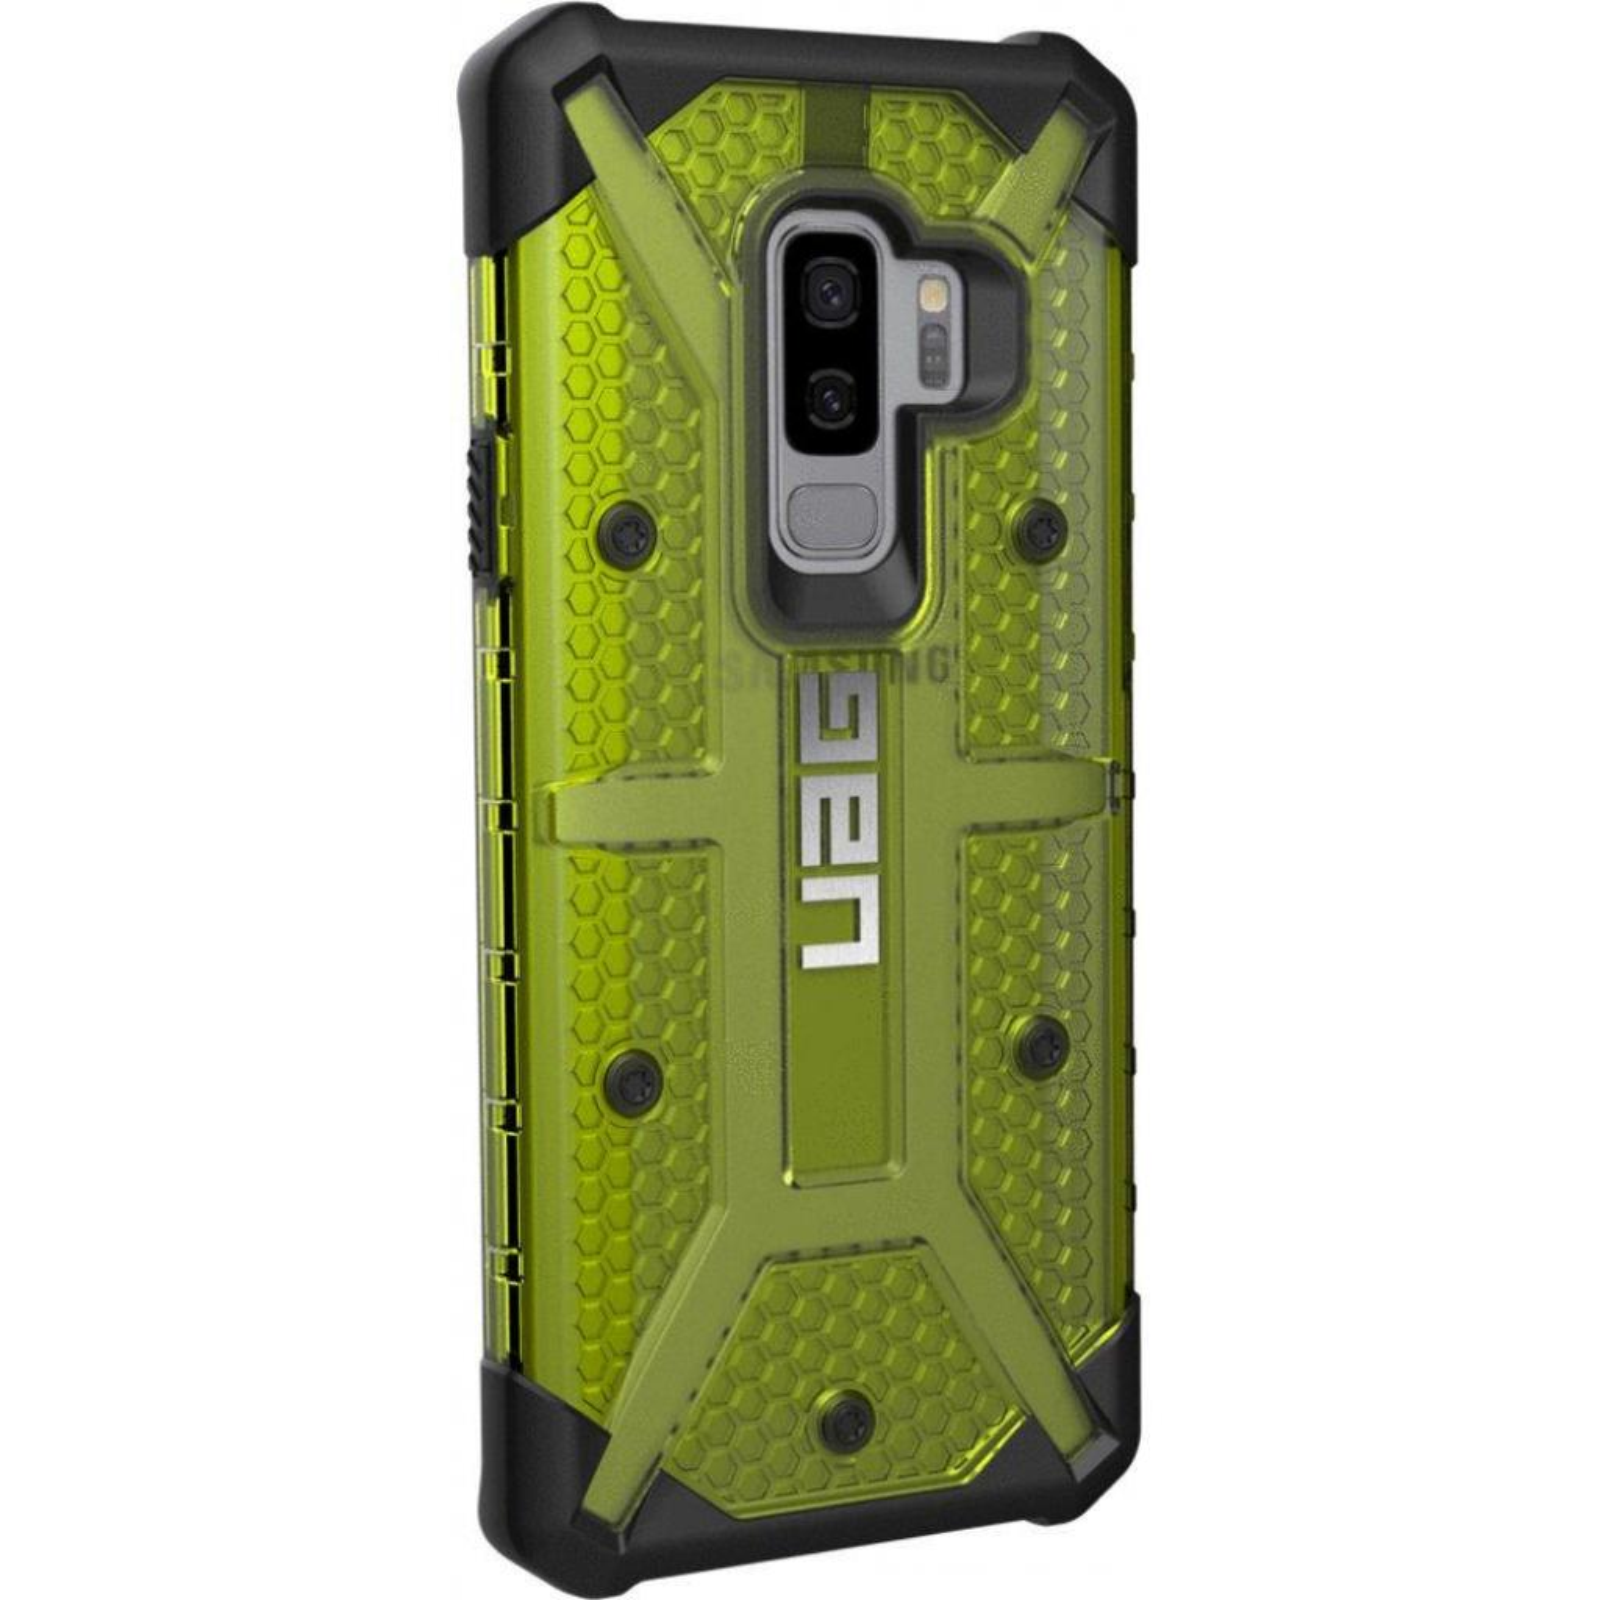 Чехол для моб. телефона Urban Armor Gear Galaxy S9+ Plasma Citron (GLXS9PLS-L-CT) изображение 3